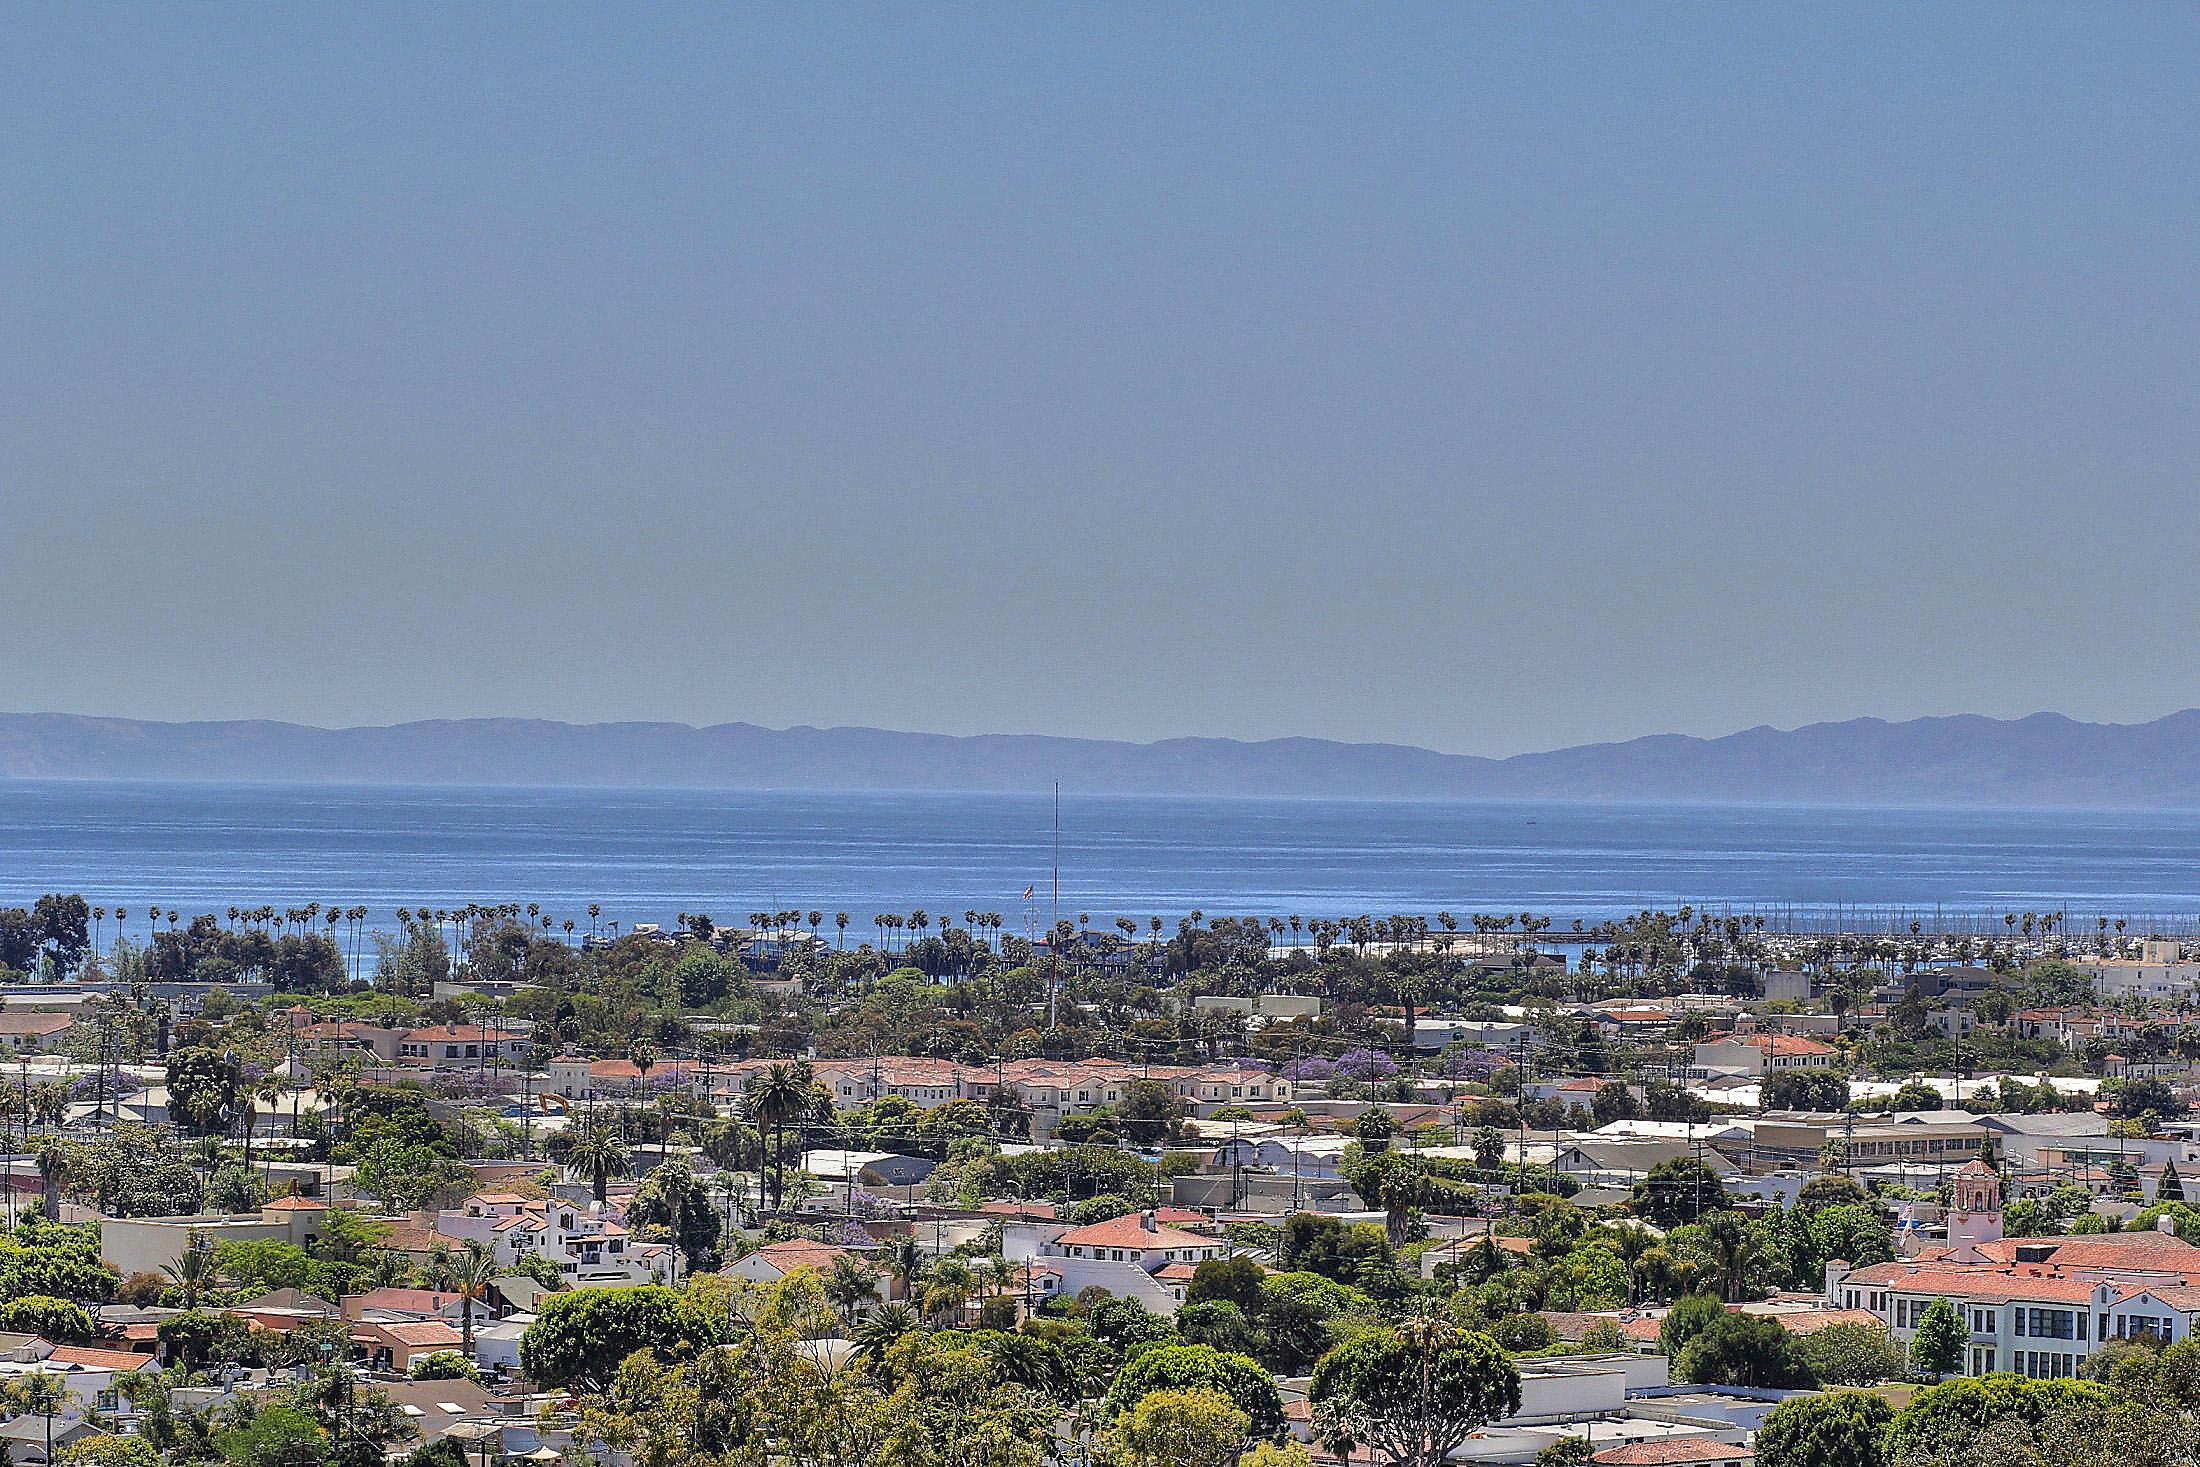 Property photo for 869 Ferrelo Pl Santa Barbara, California 93103 - 14-1539